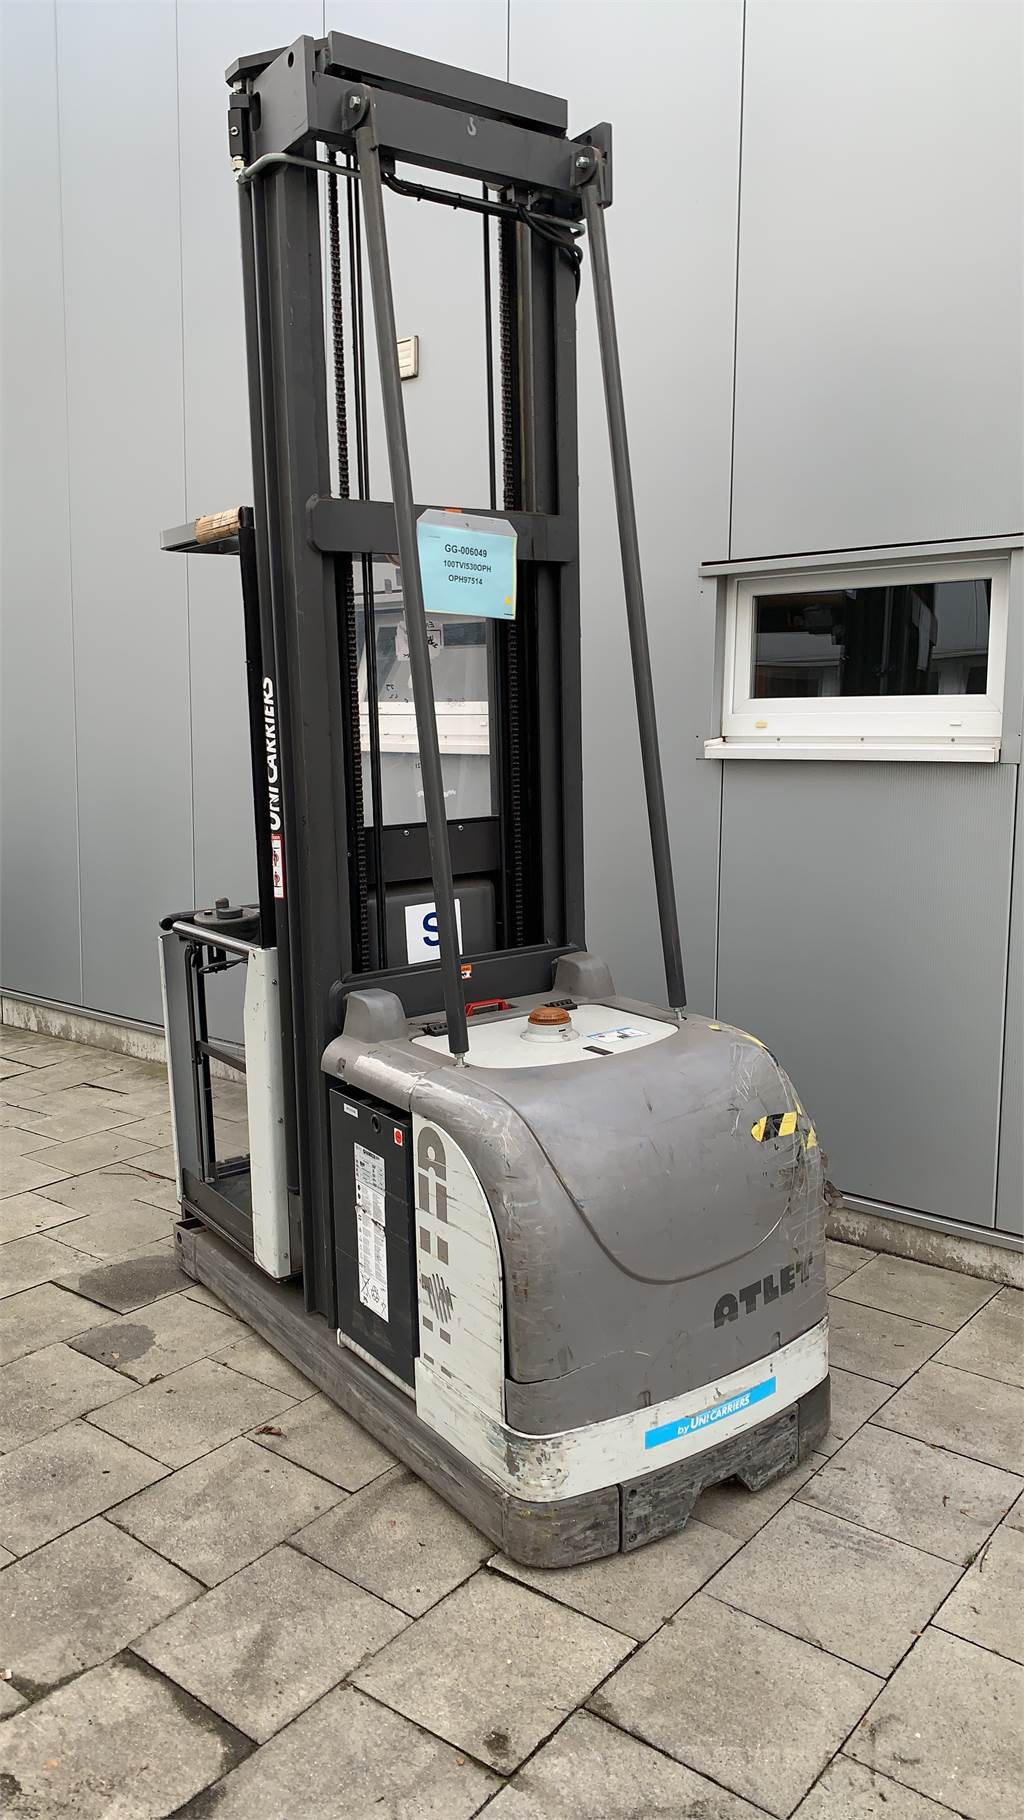 [Other] OPH100TVI530, Mittelhub-Kommissionierer, Flurförderzeuge